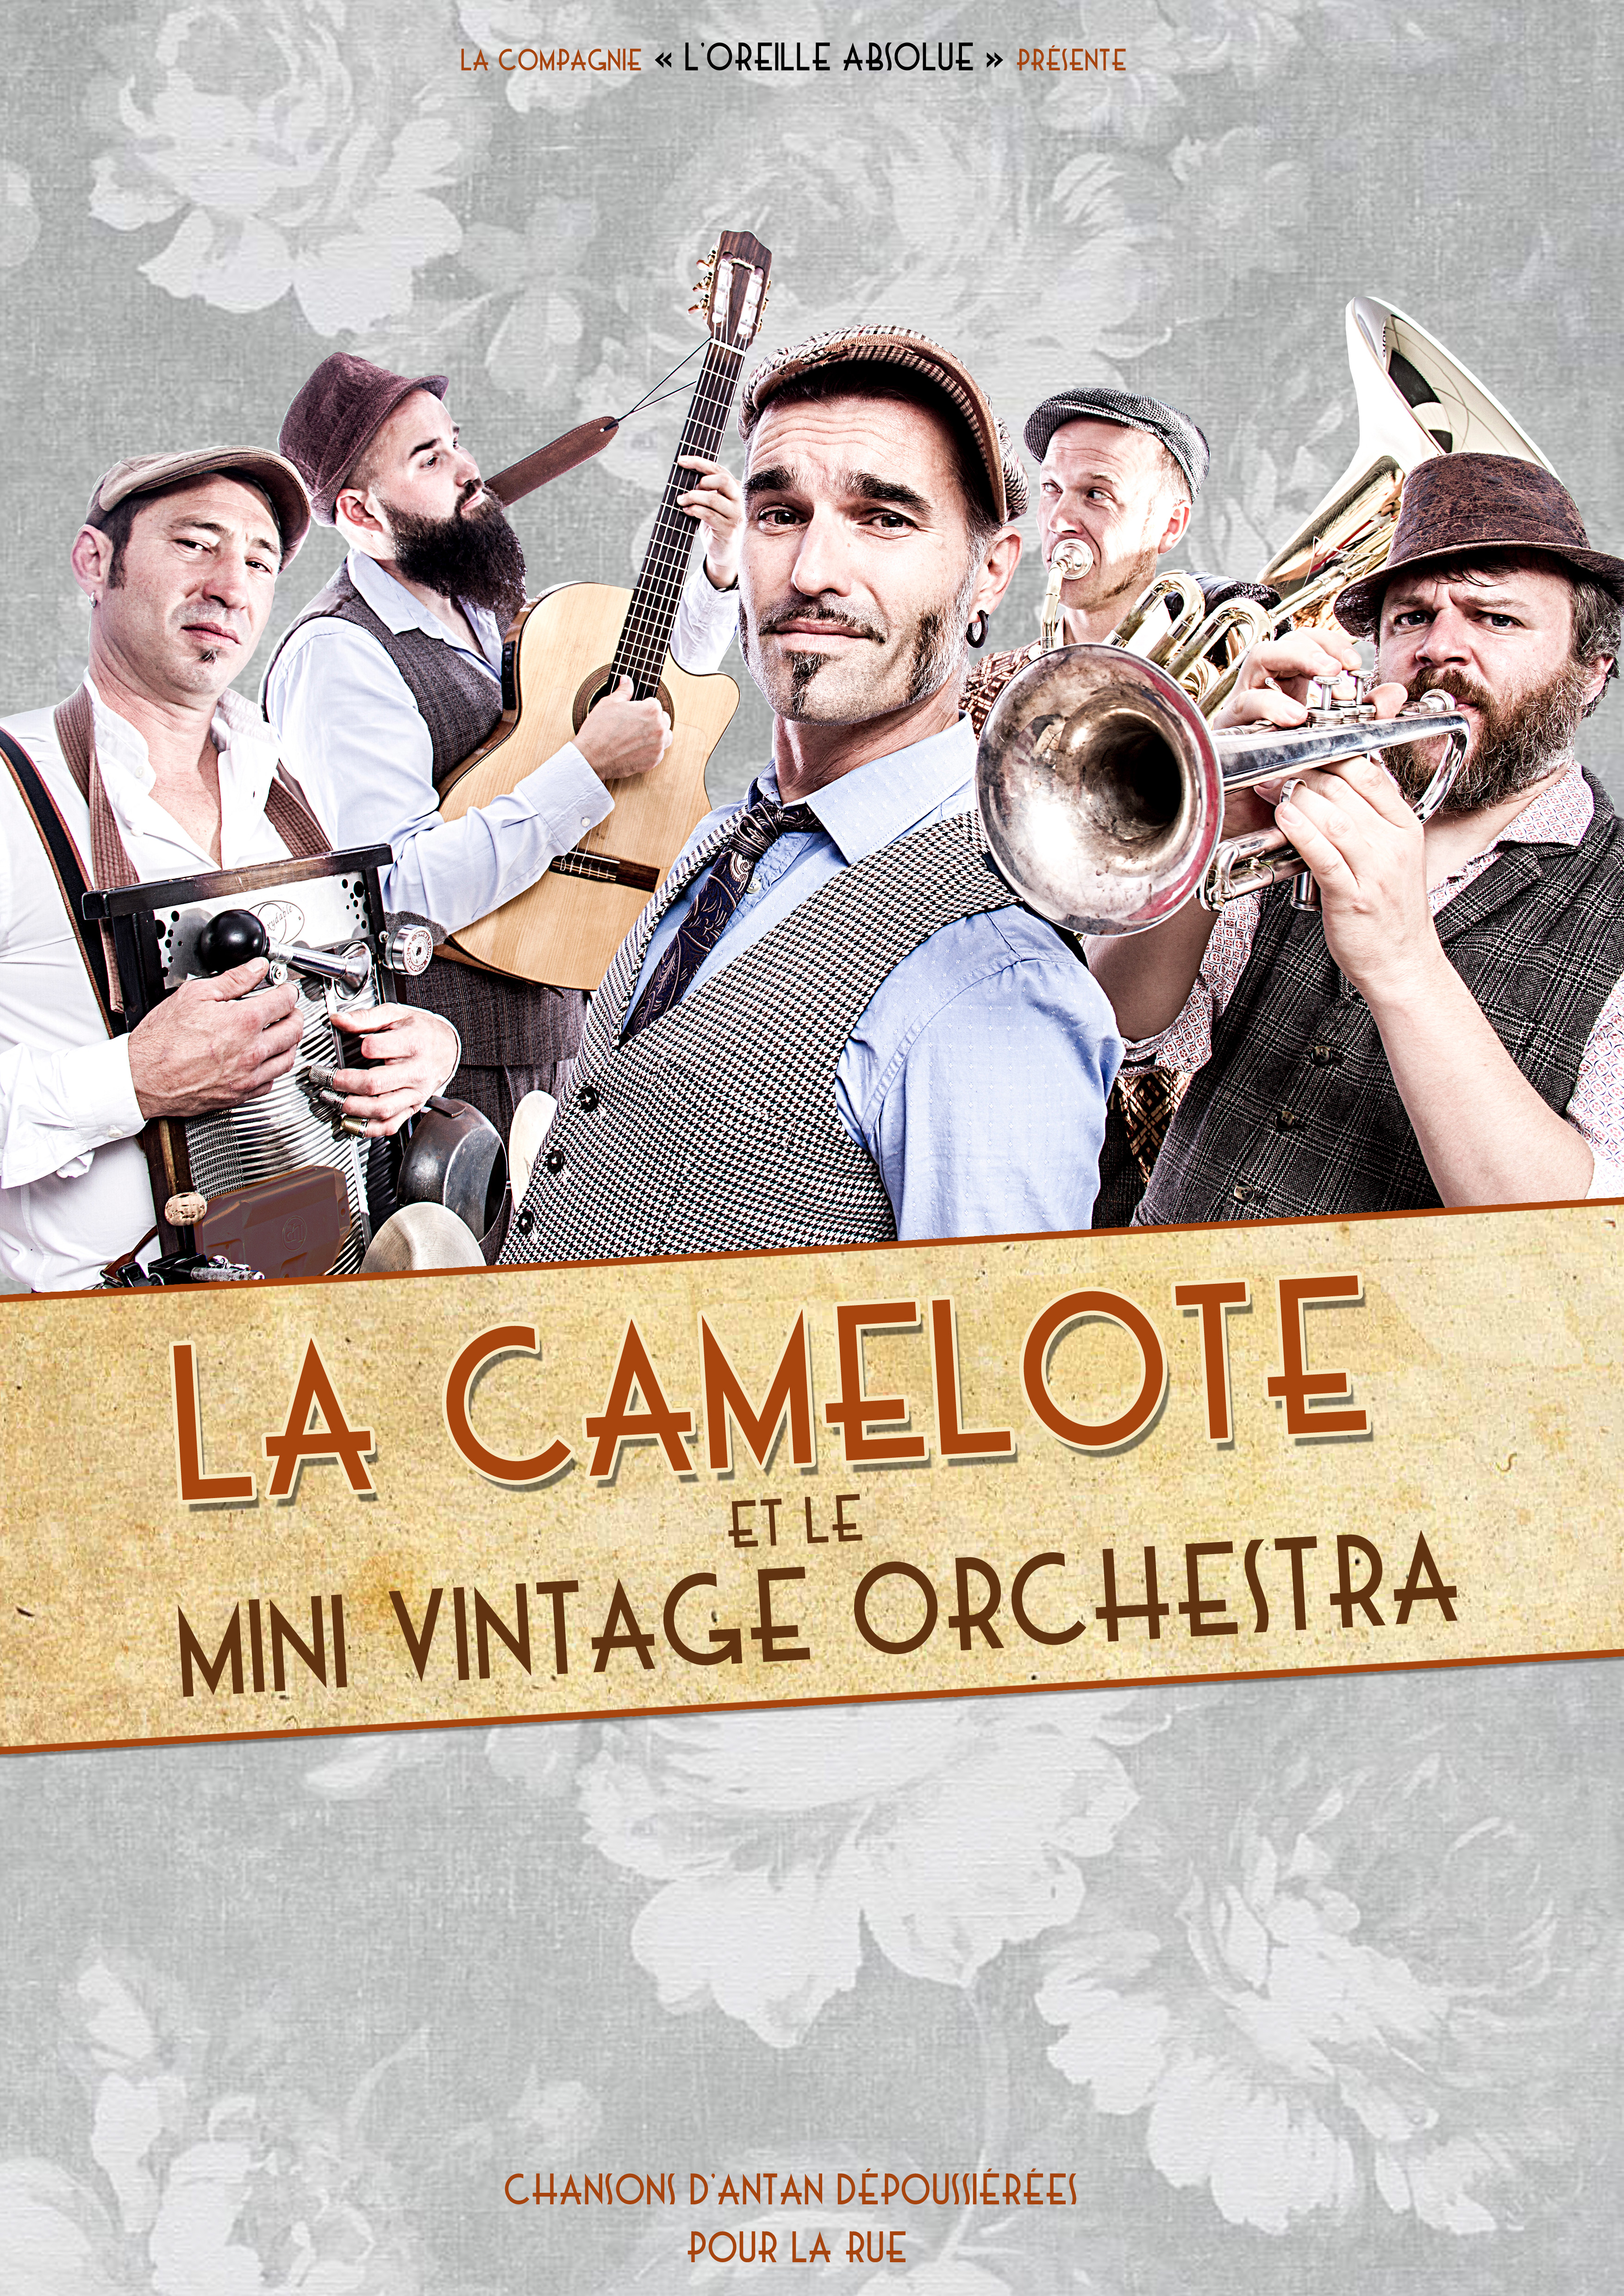 CAMELOTE et ini Vintage Orchestra 2